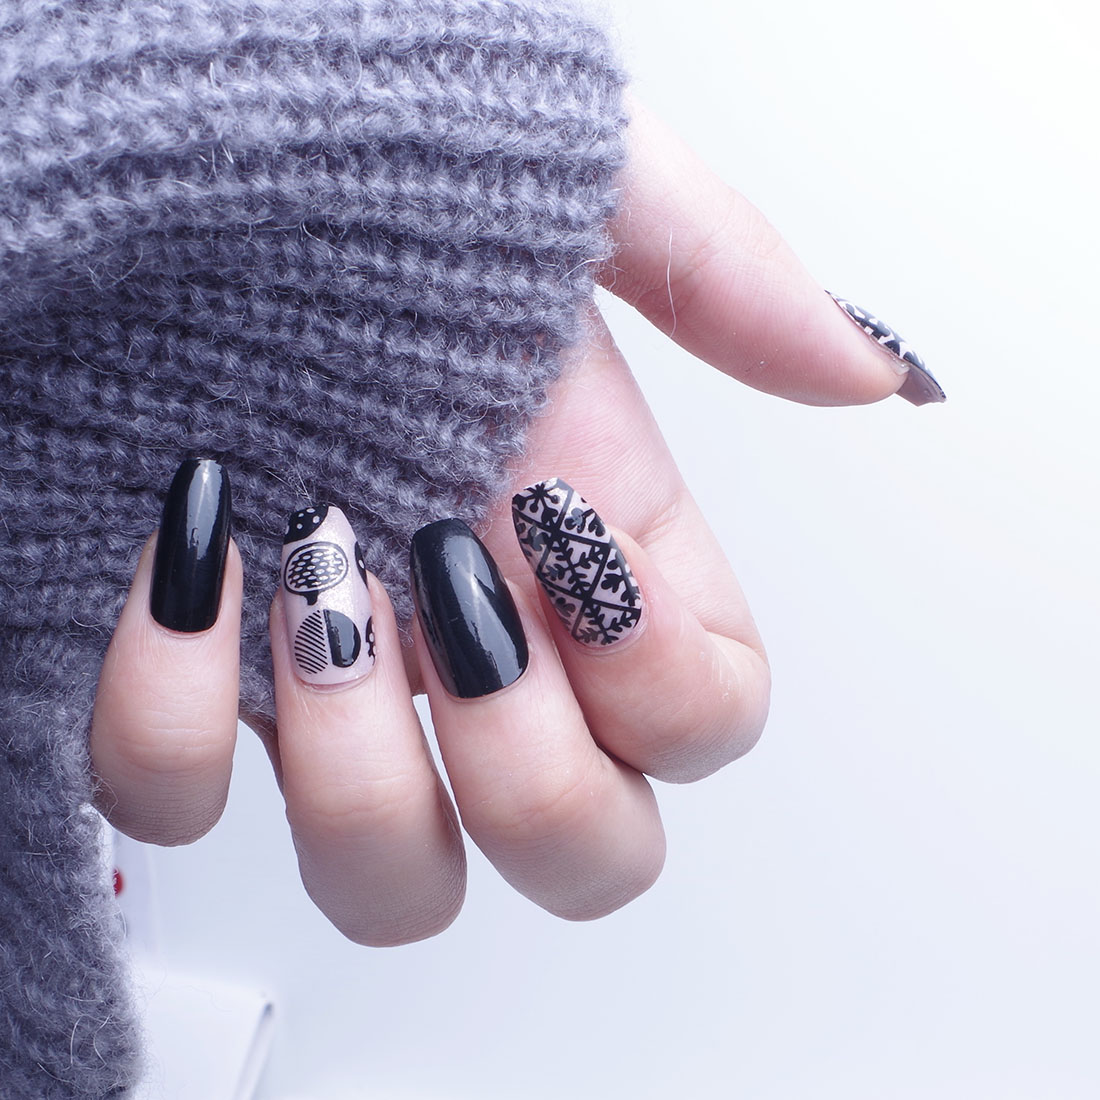 foreverlil 24Pcs Short False Nails Black Frosted Artificial Nail ...